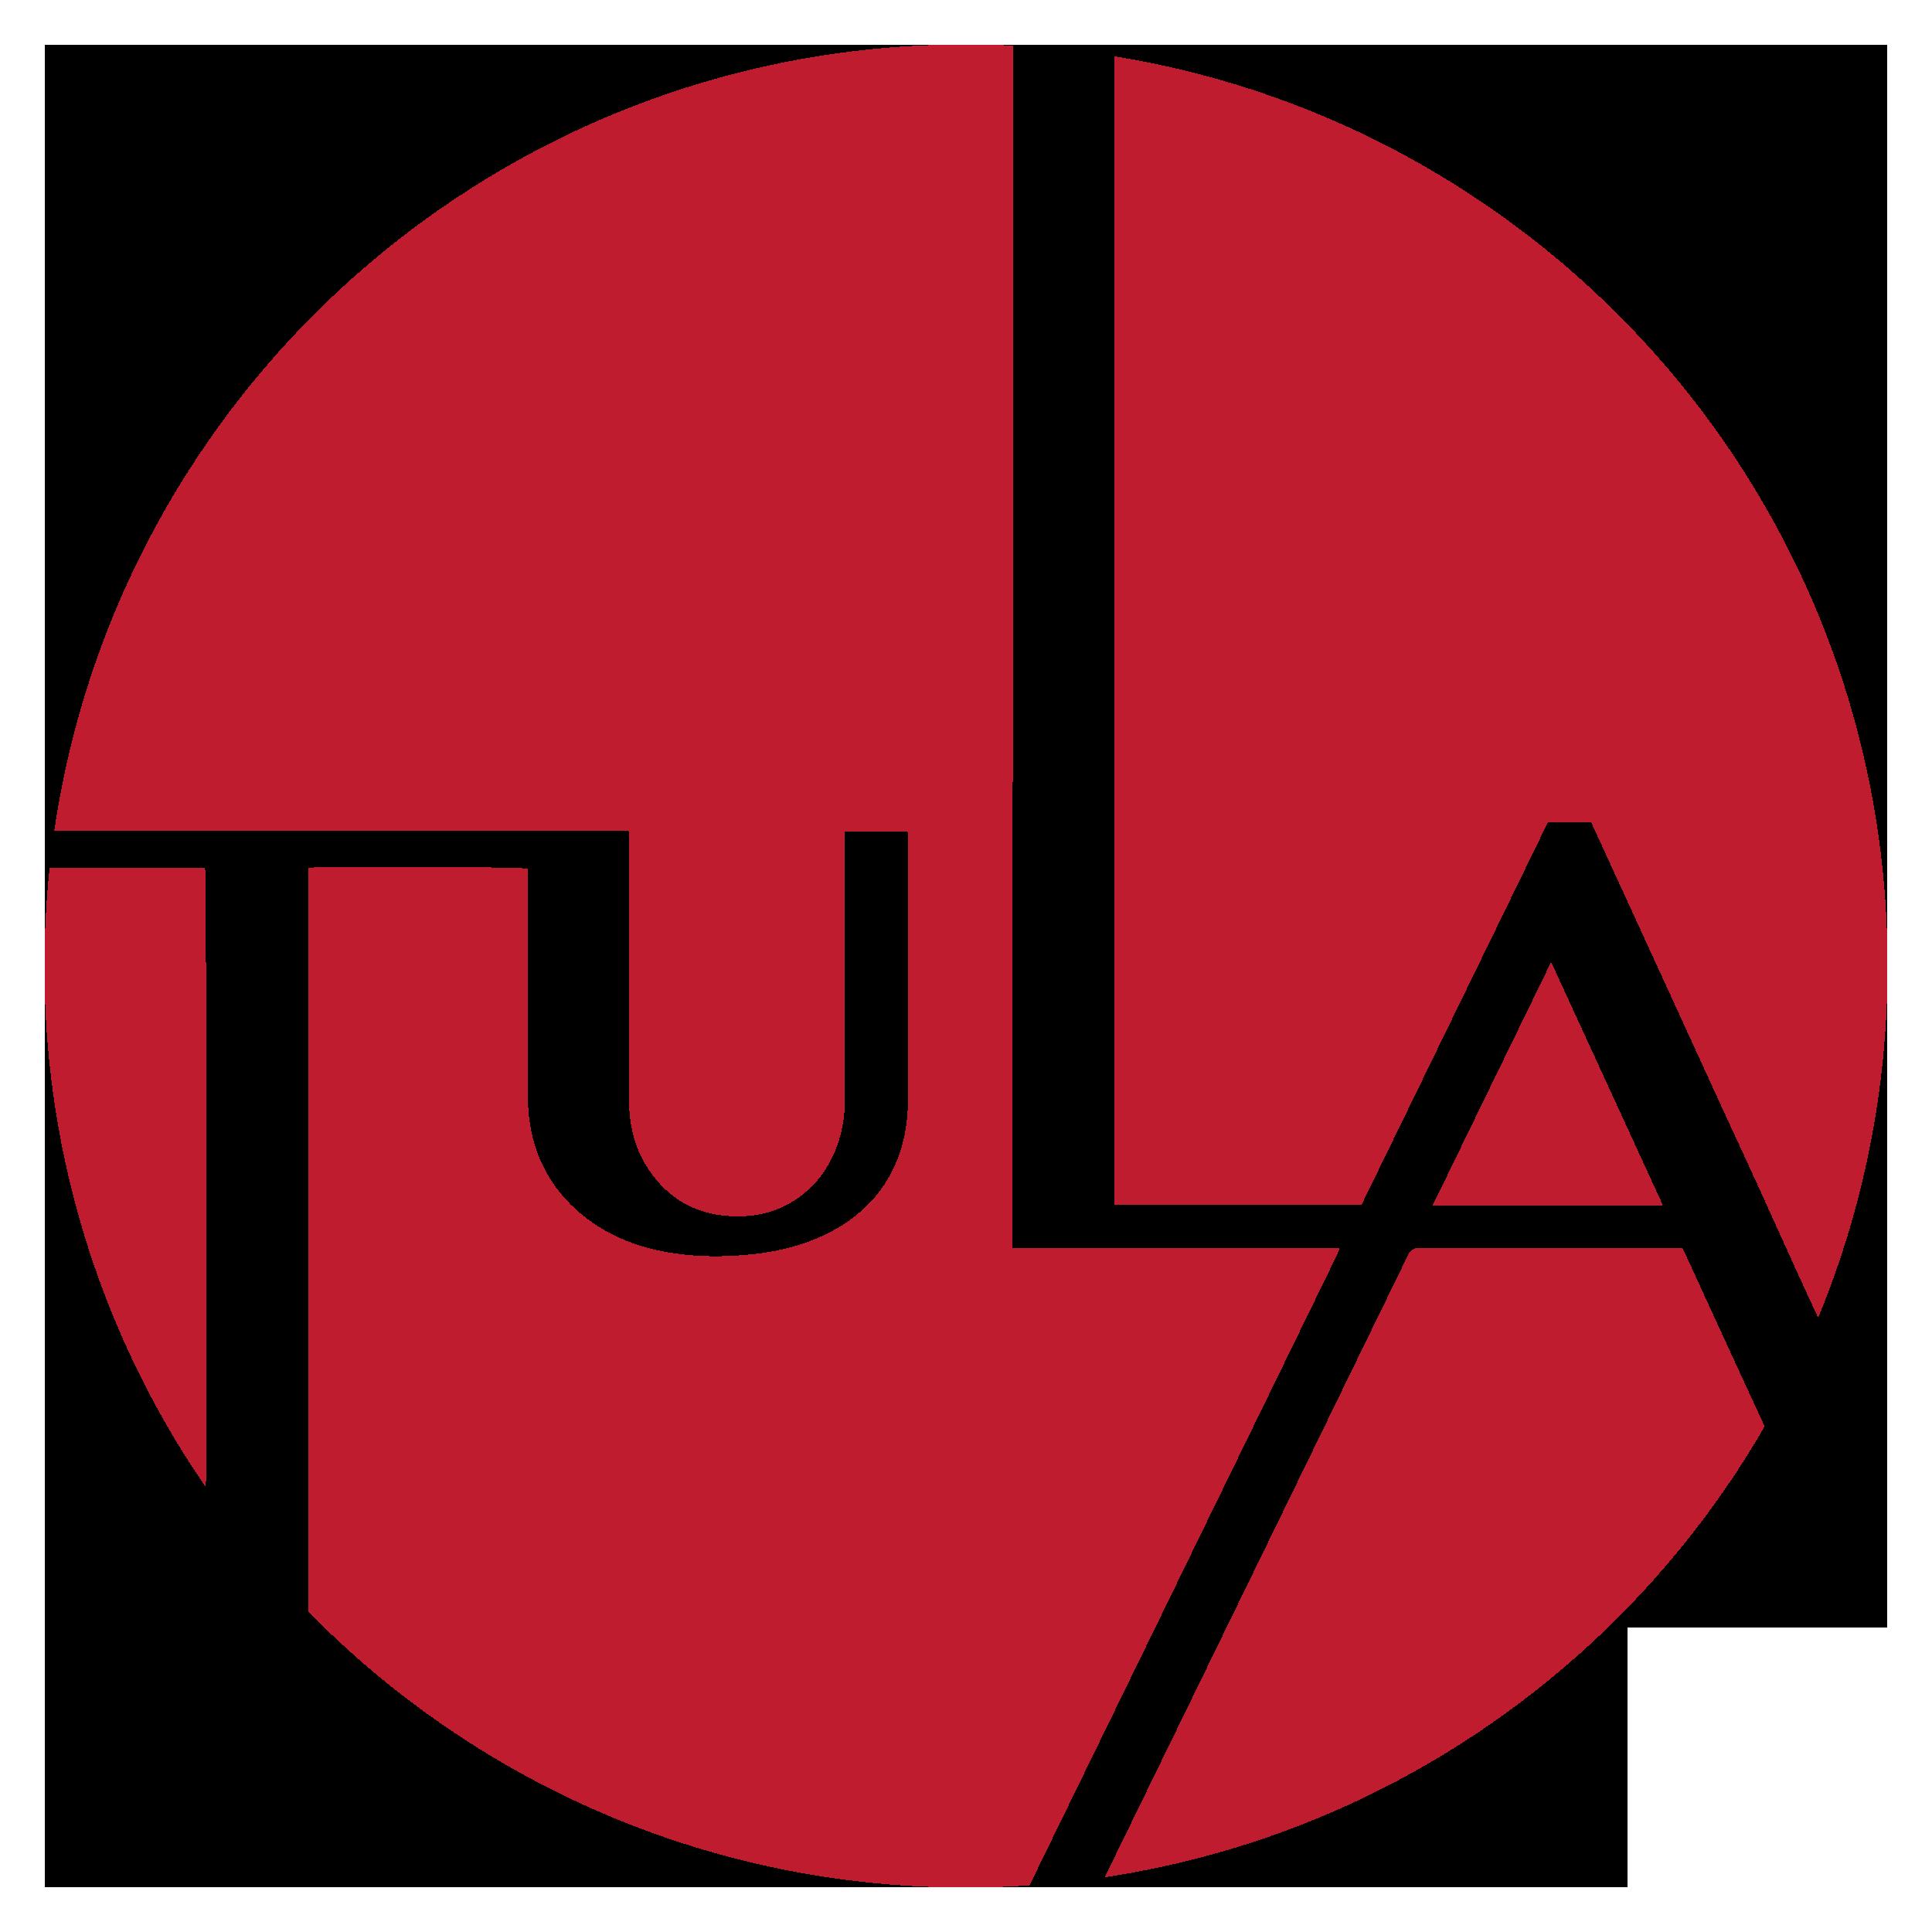 TULA Mics USB Microphone